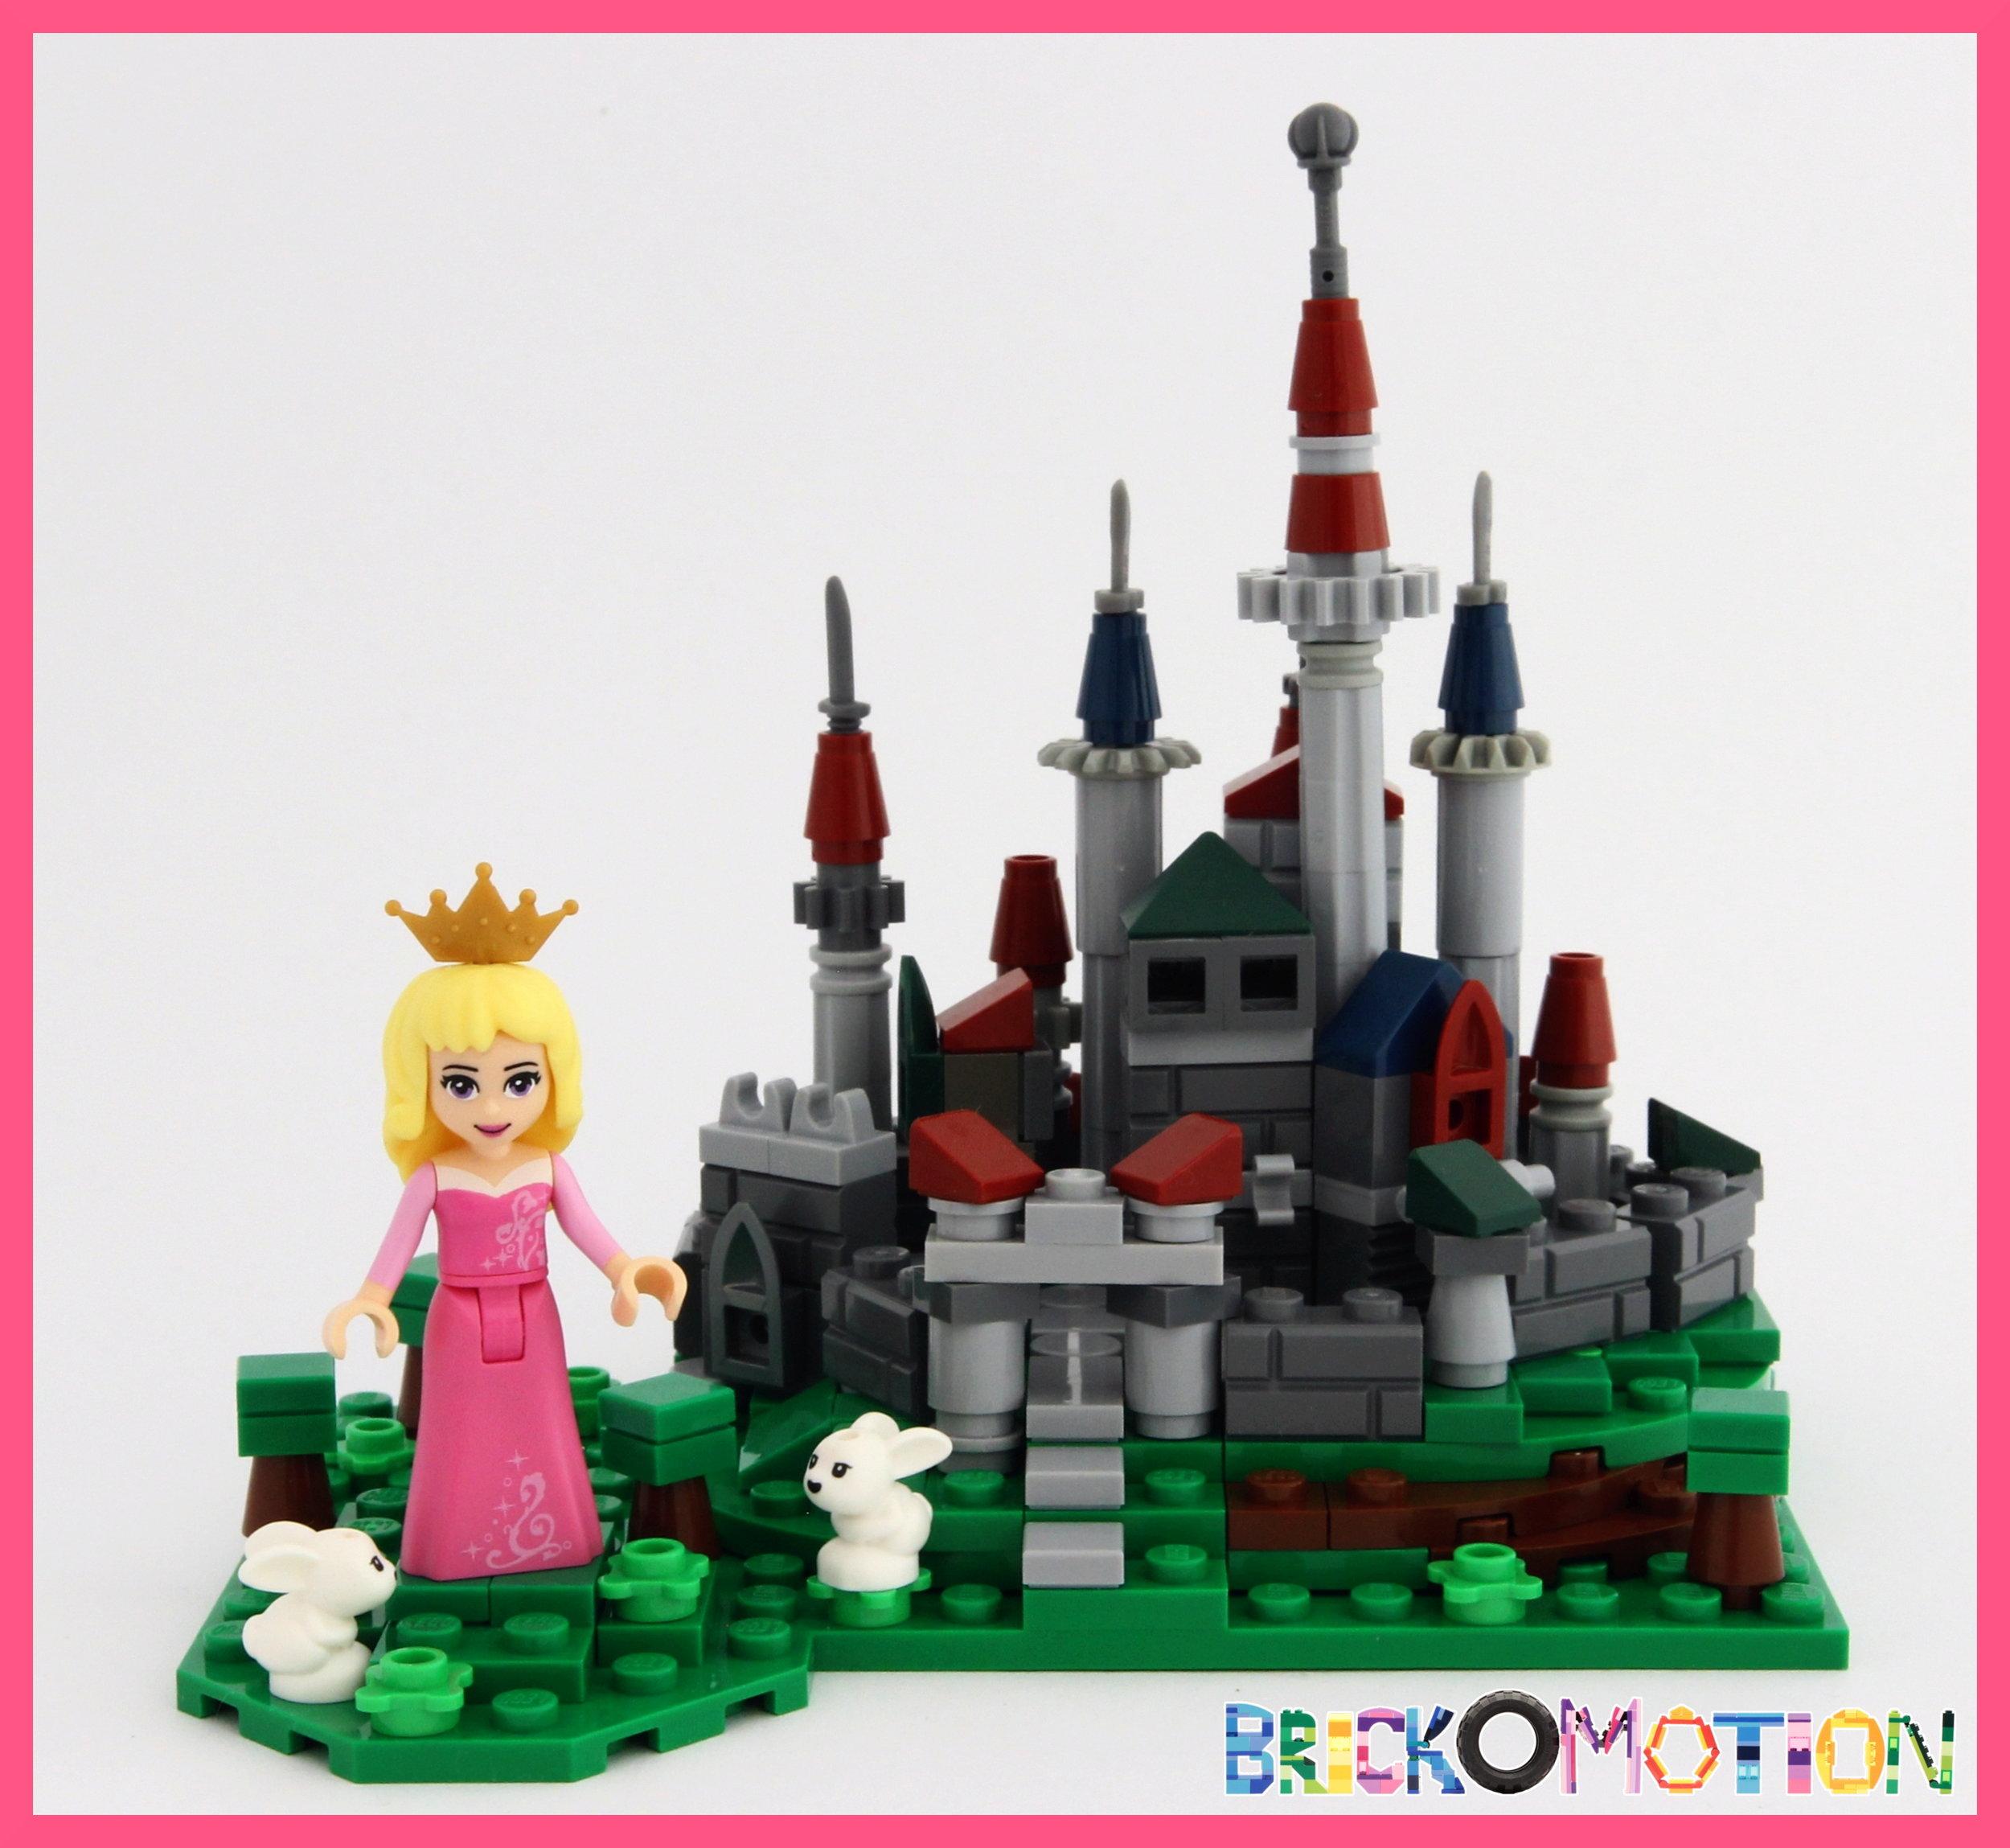 Aurora's microcastle